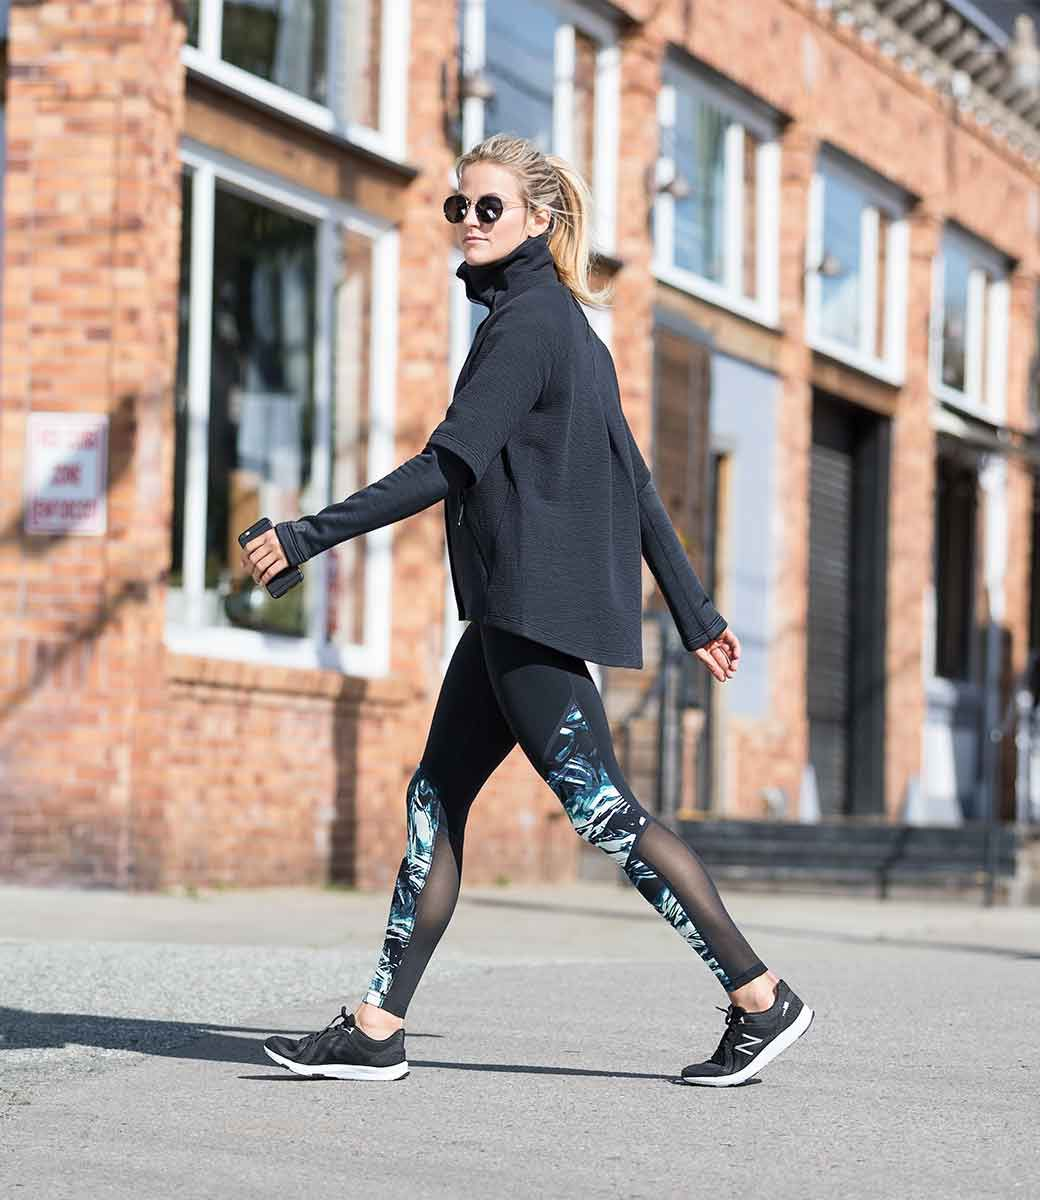 New Balance Womens FuelCore Transform and Womens Fashion,